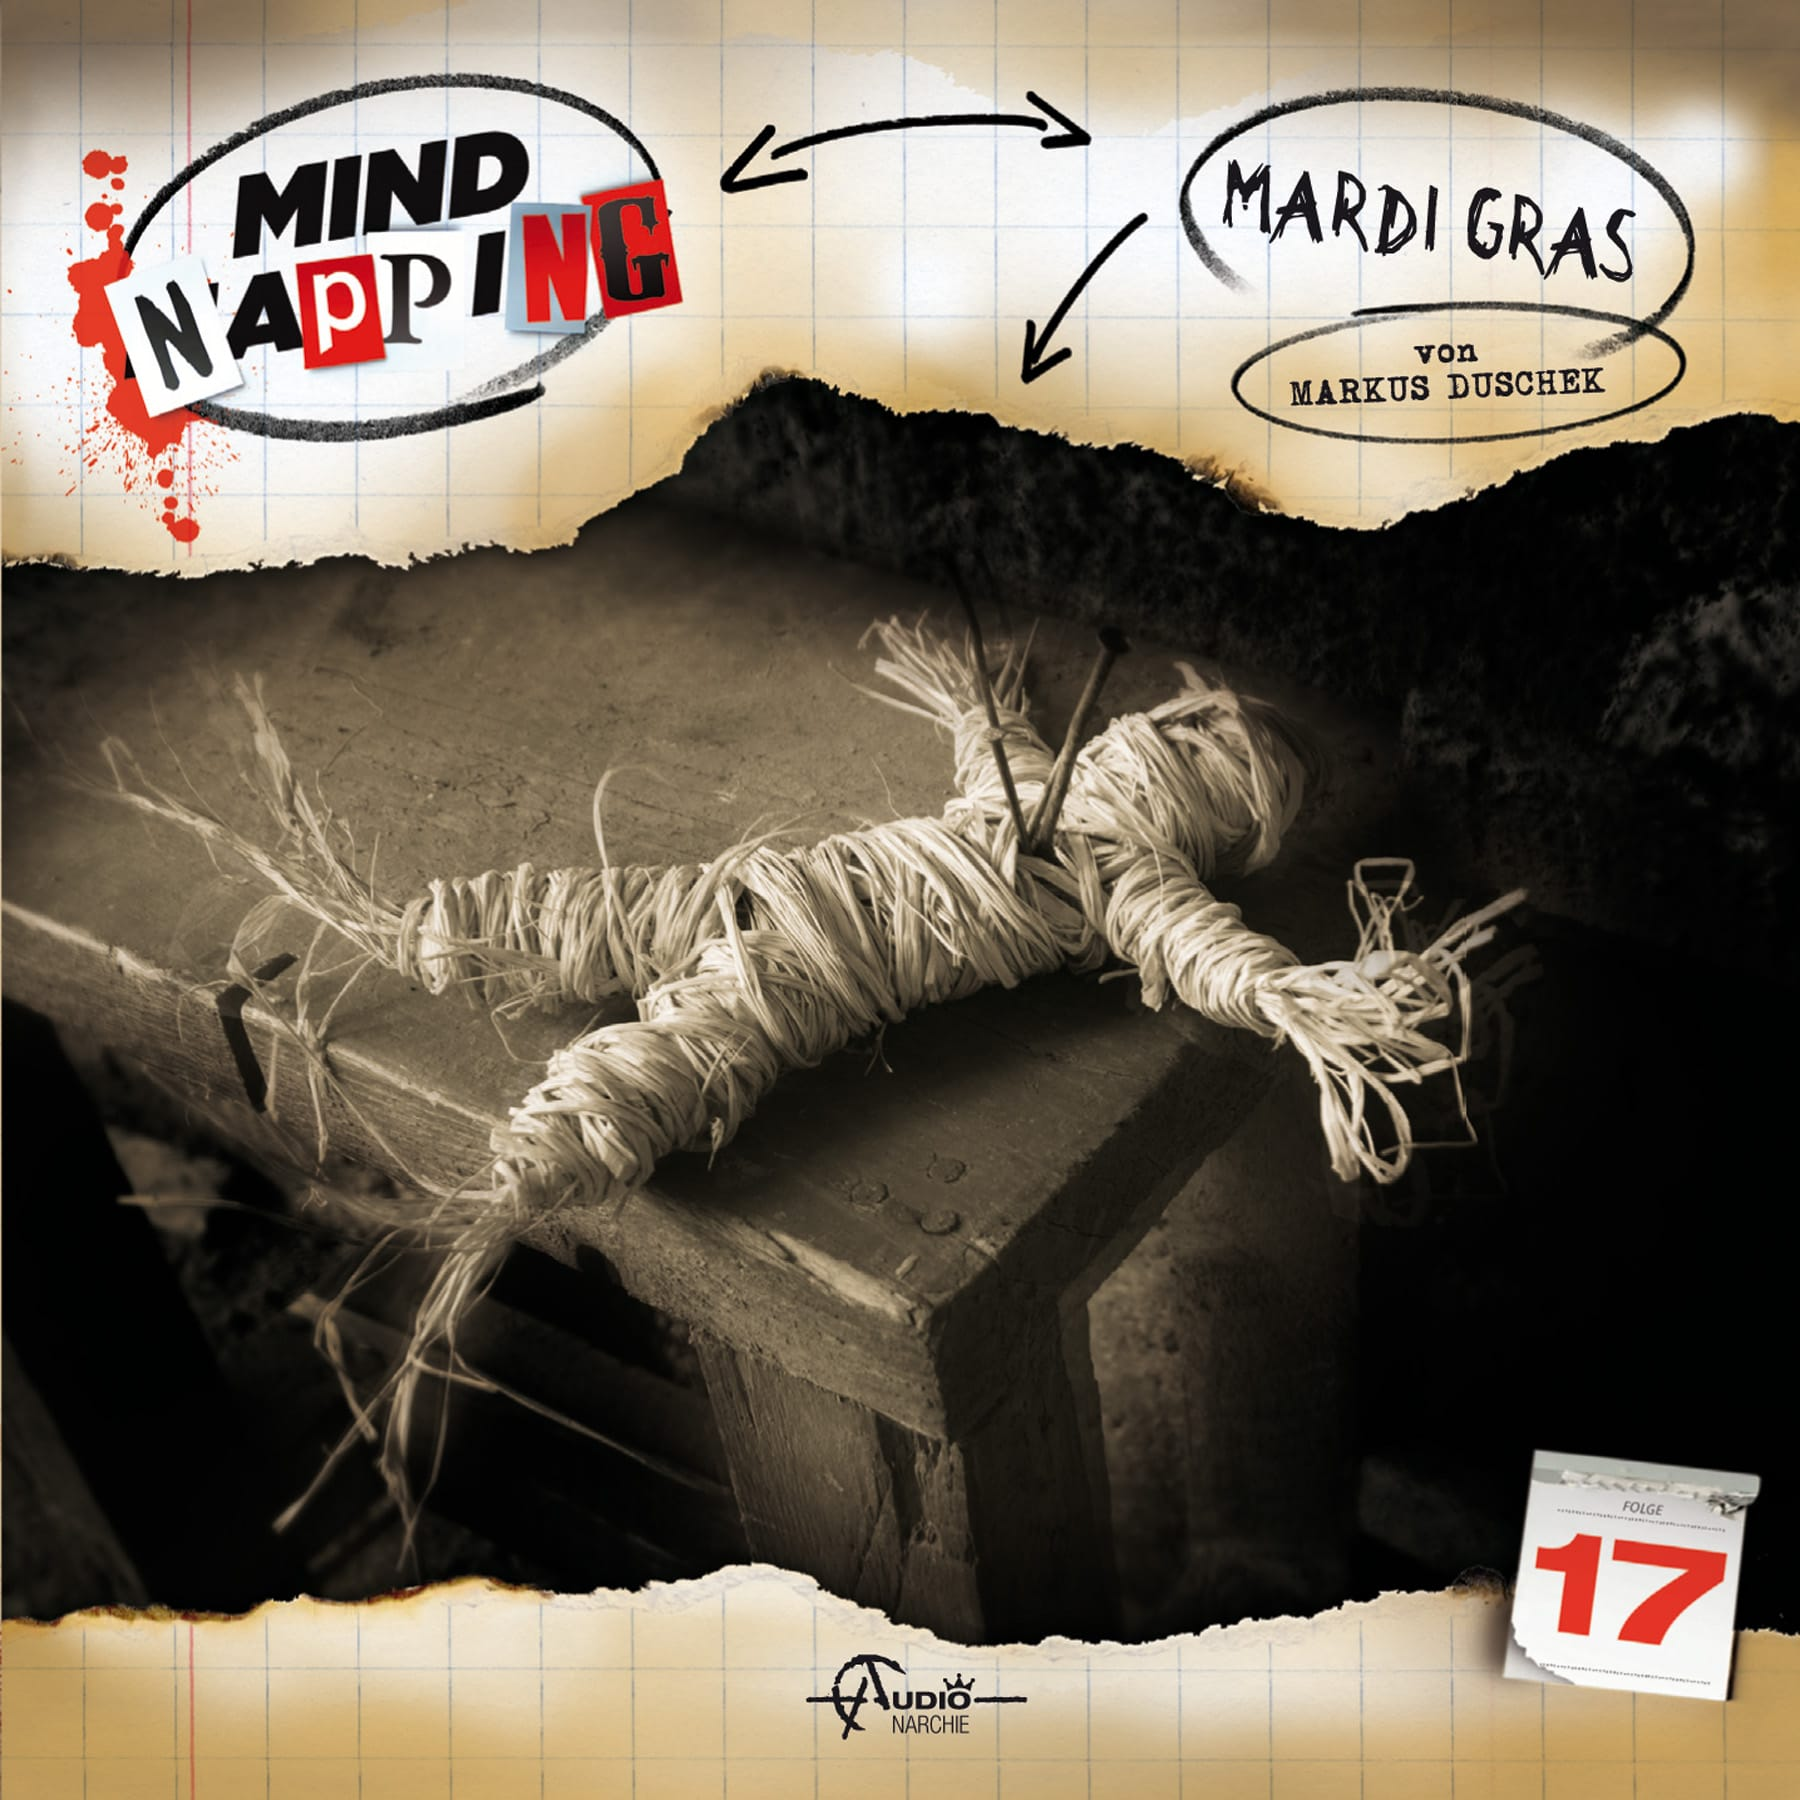 Mindnapping (17) – Mardi Gras